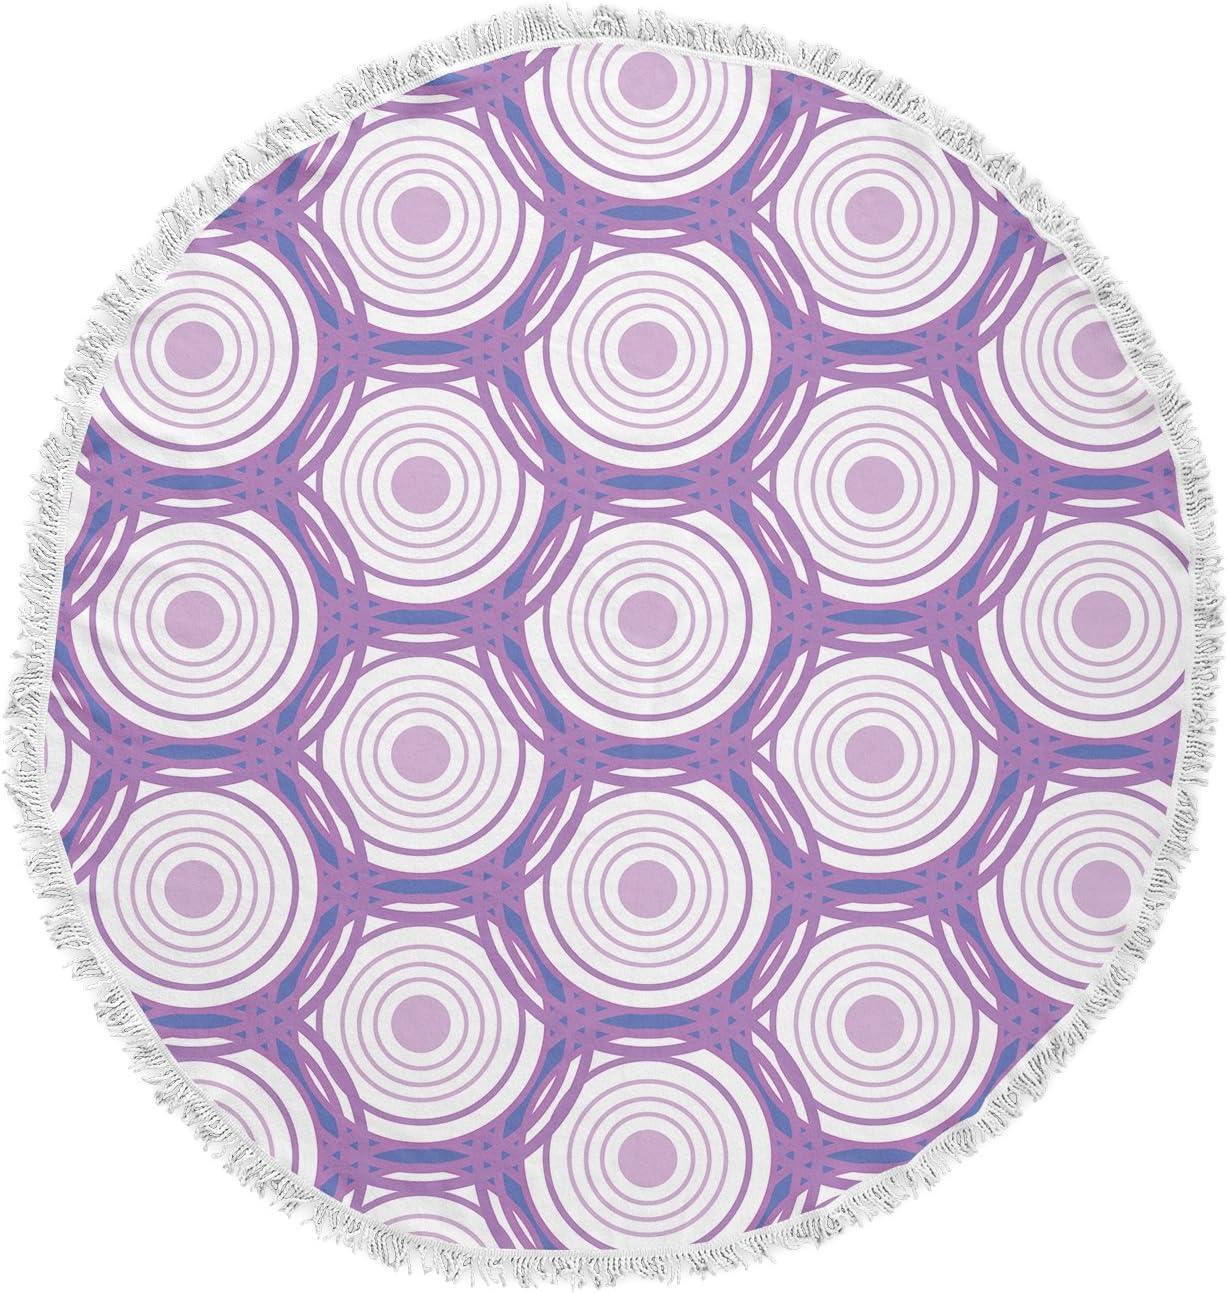 KESS InHouse Louise Labyrinth Purple Round Beach Towel Blanket